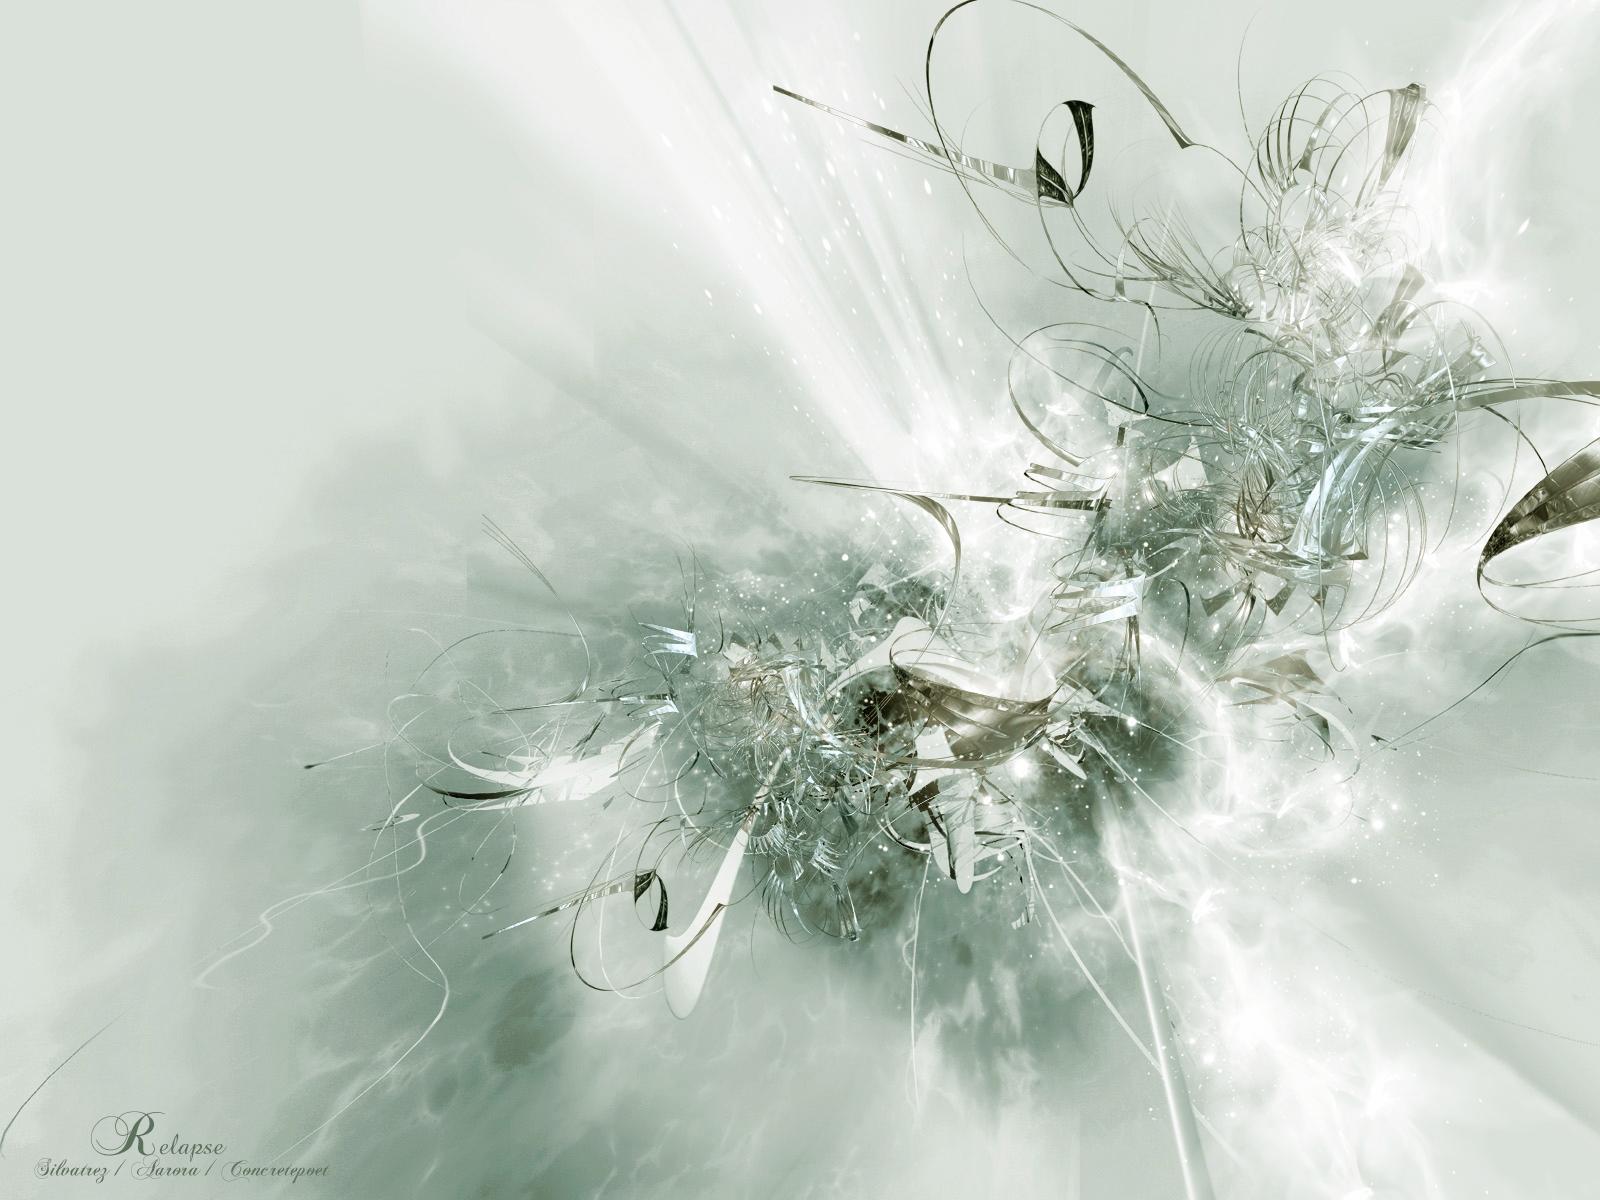 Artistic Cgi Colors Pattern Shapes Texture White 1600x1200